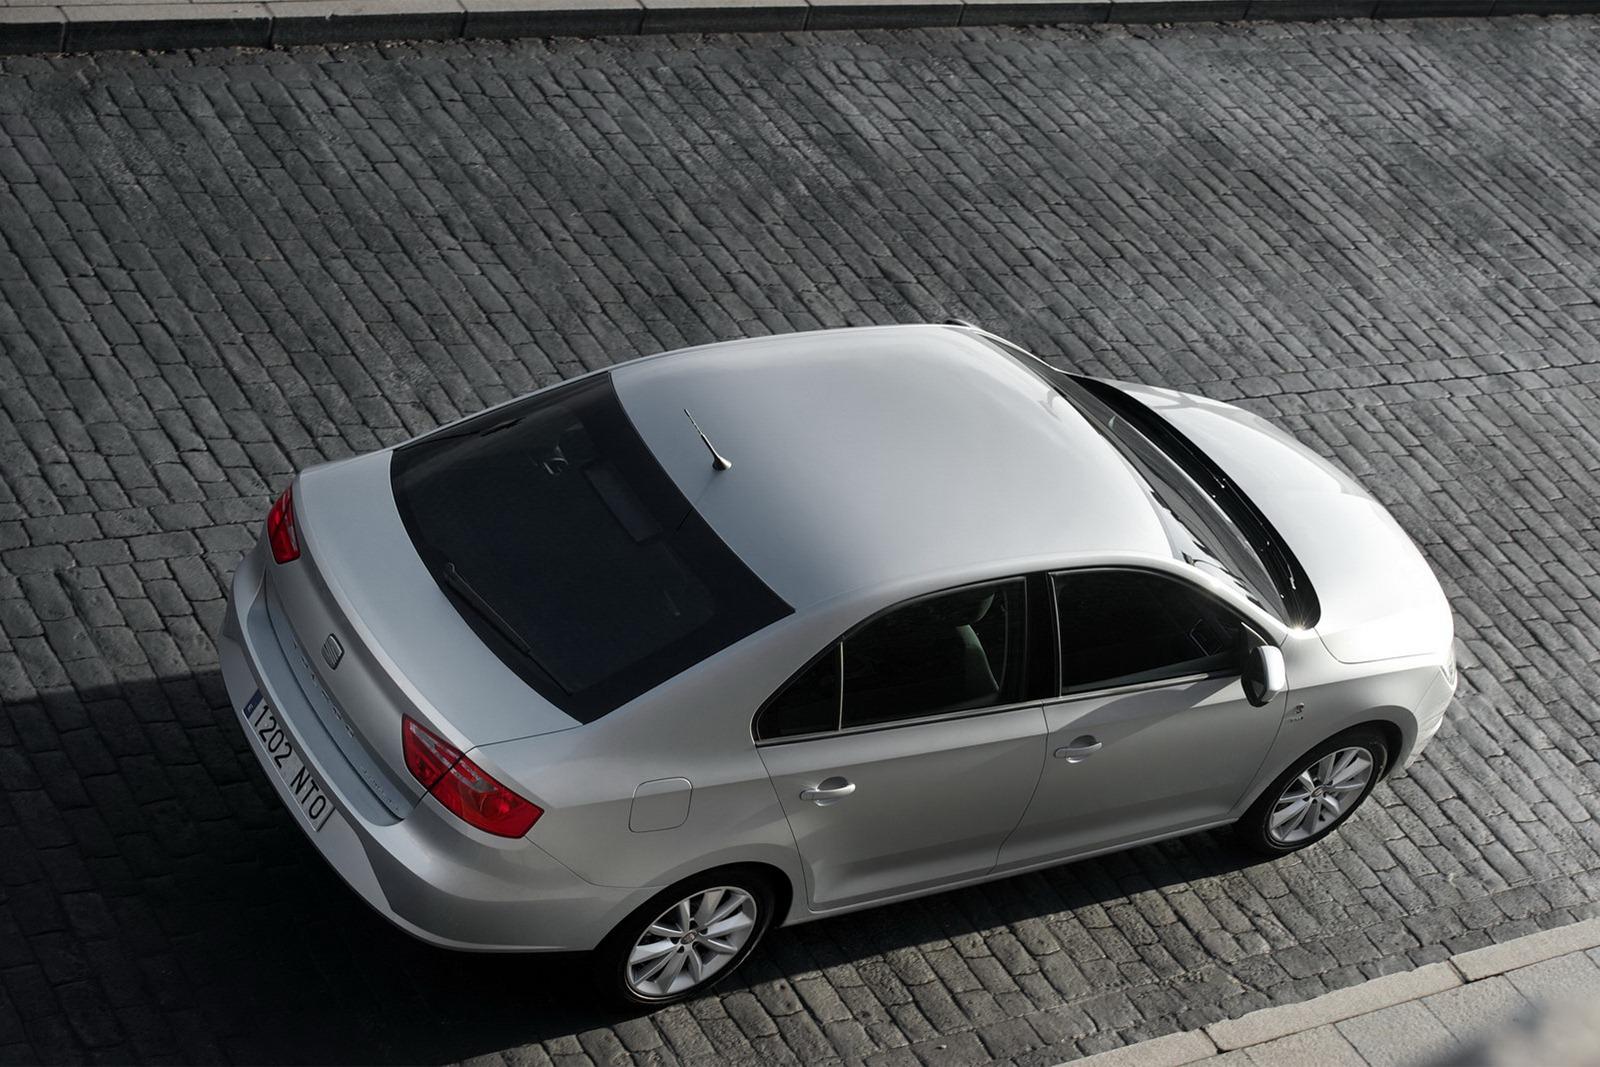 2012 - [Seat] Toledo IV - Page 6 2013-Seat-Toledo-Sedan-34%25255B2%25255D